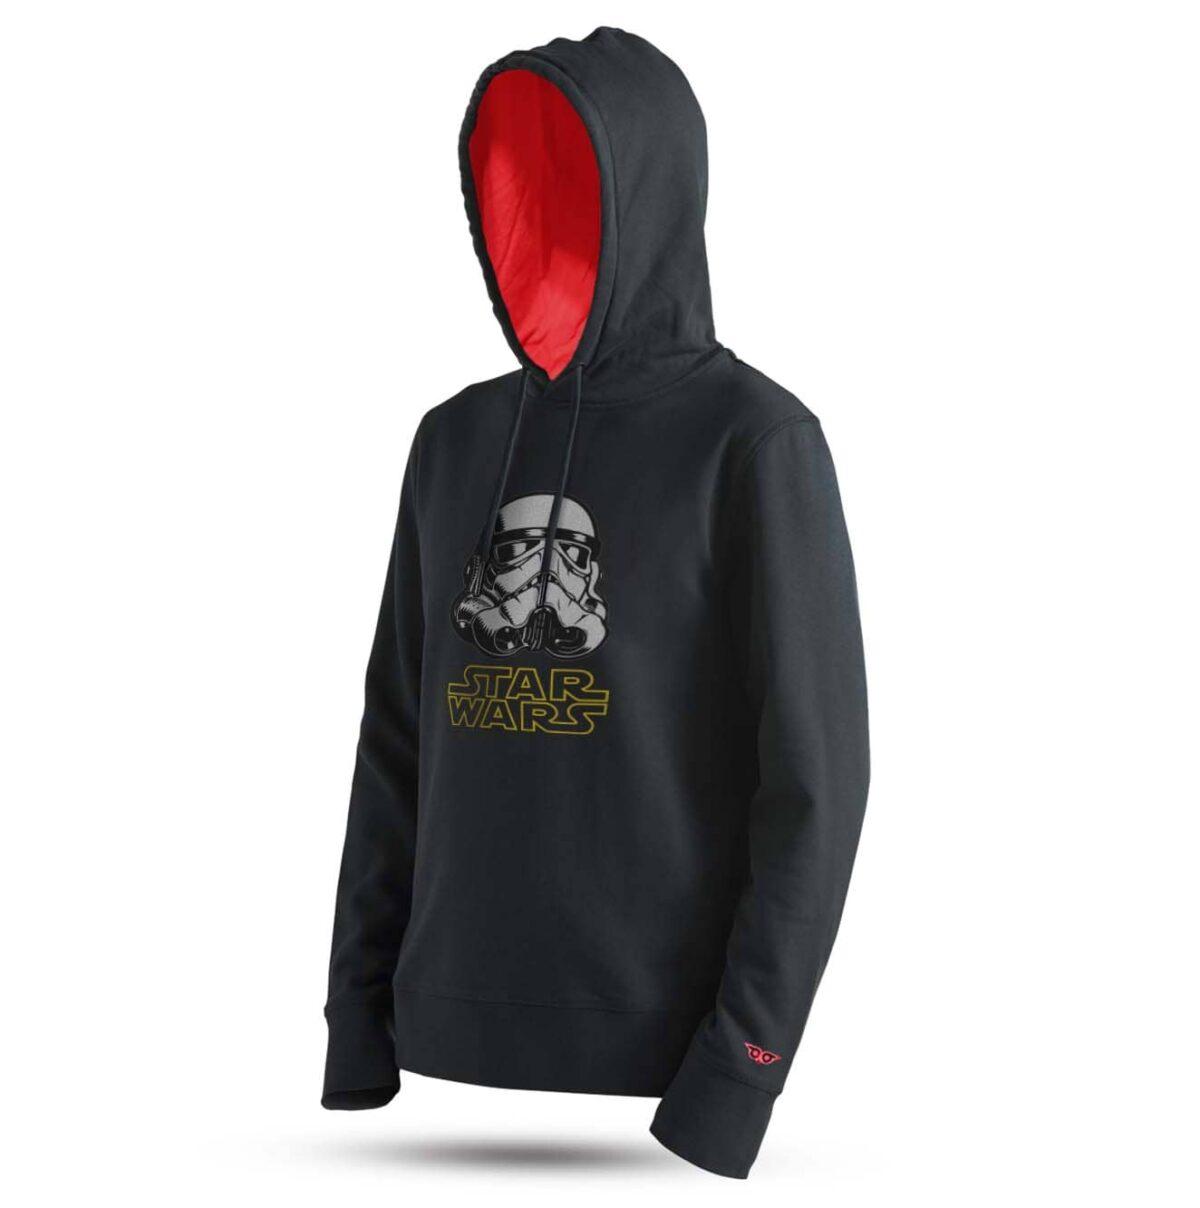 tarrzz-tasarim-kapsonlu-sweatshirt-star-wars-firtina-birlikleri-baskili-sweatshirt